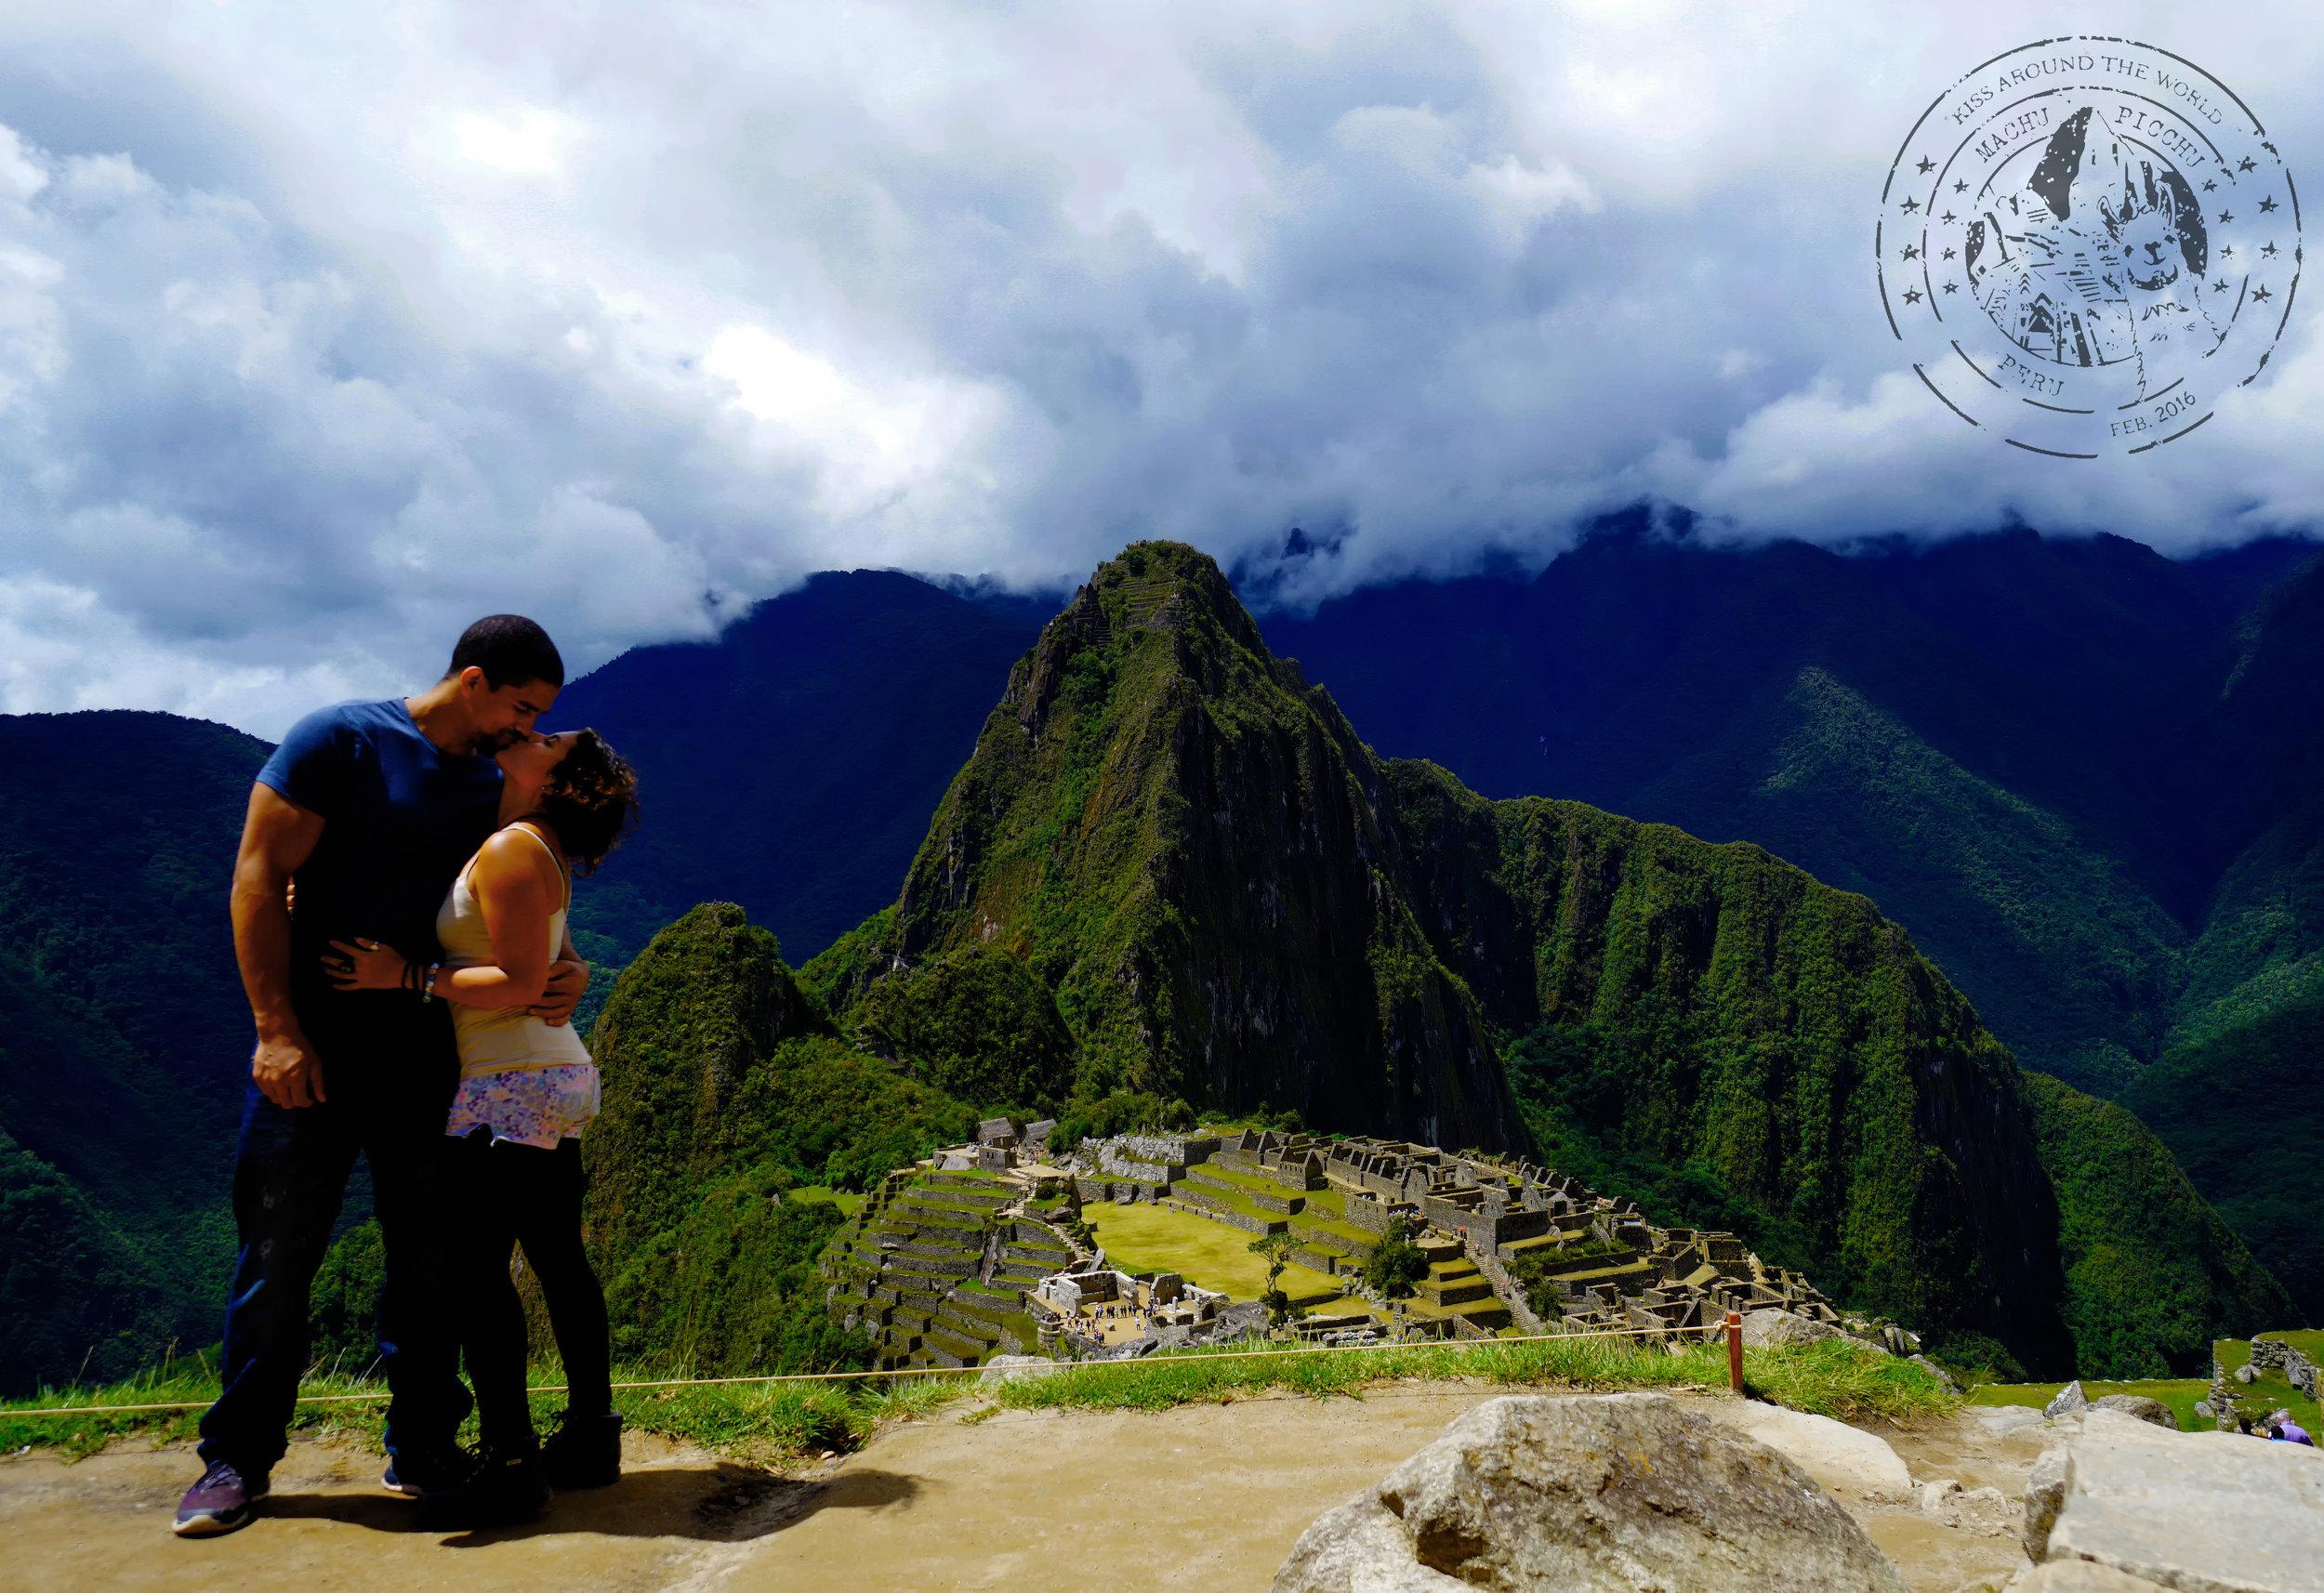 vickygood_photography_Peru_travel_kiss.JPG.jpg